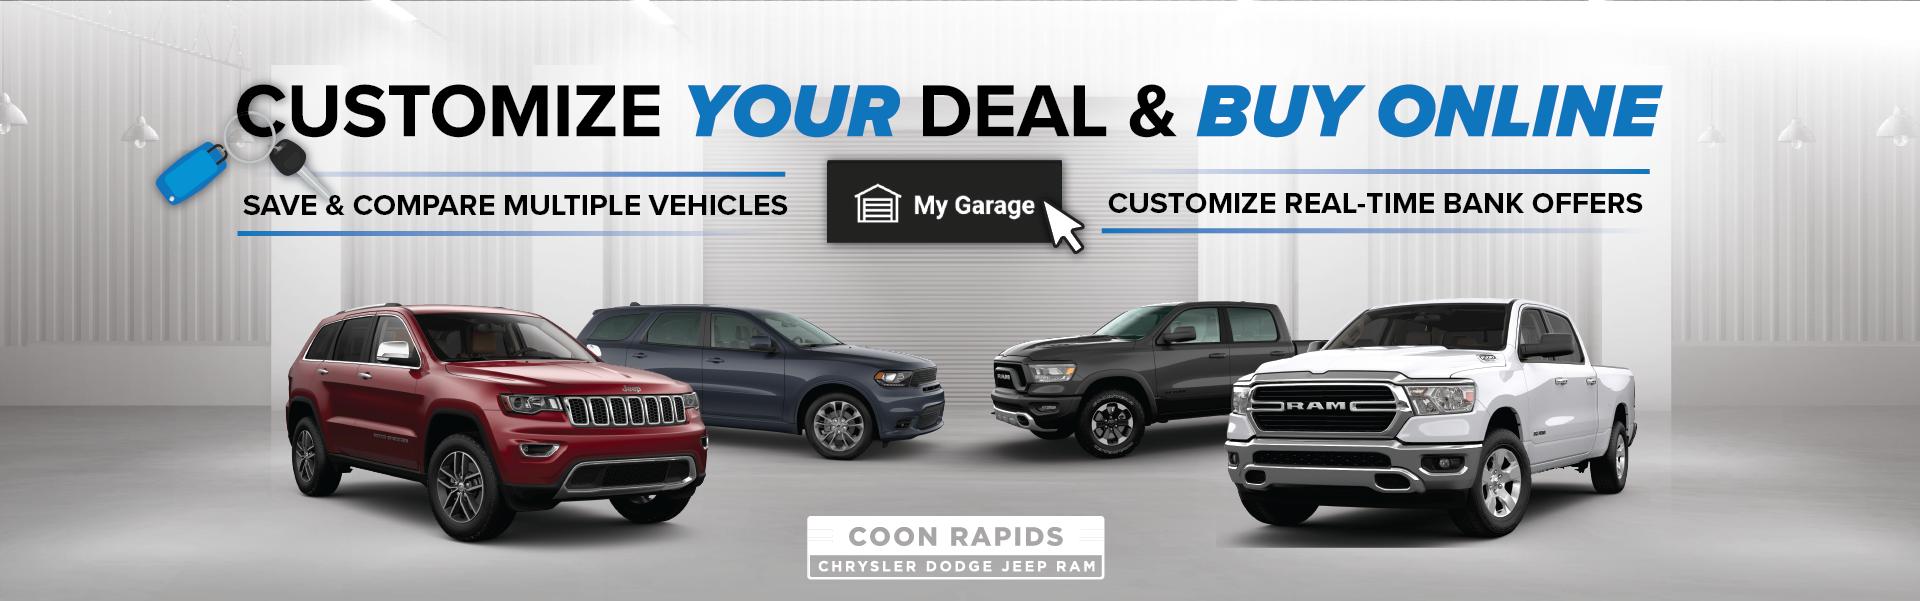 Chrysler Dealership Mn >> Coon Rapids Chrysler Jeep Dodge Ram New And Used Dealer In